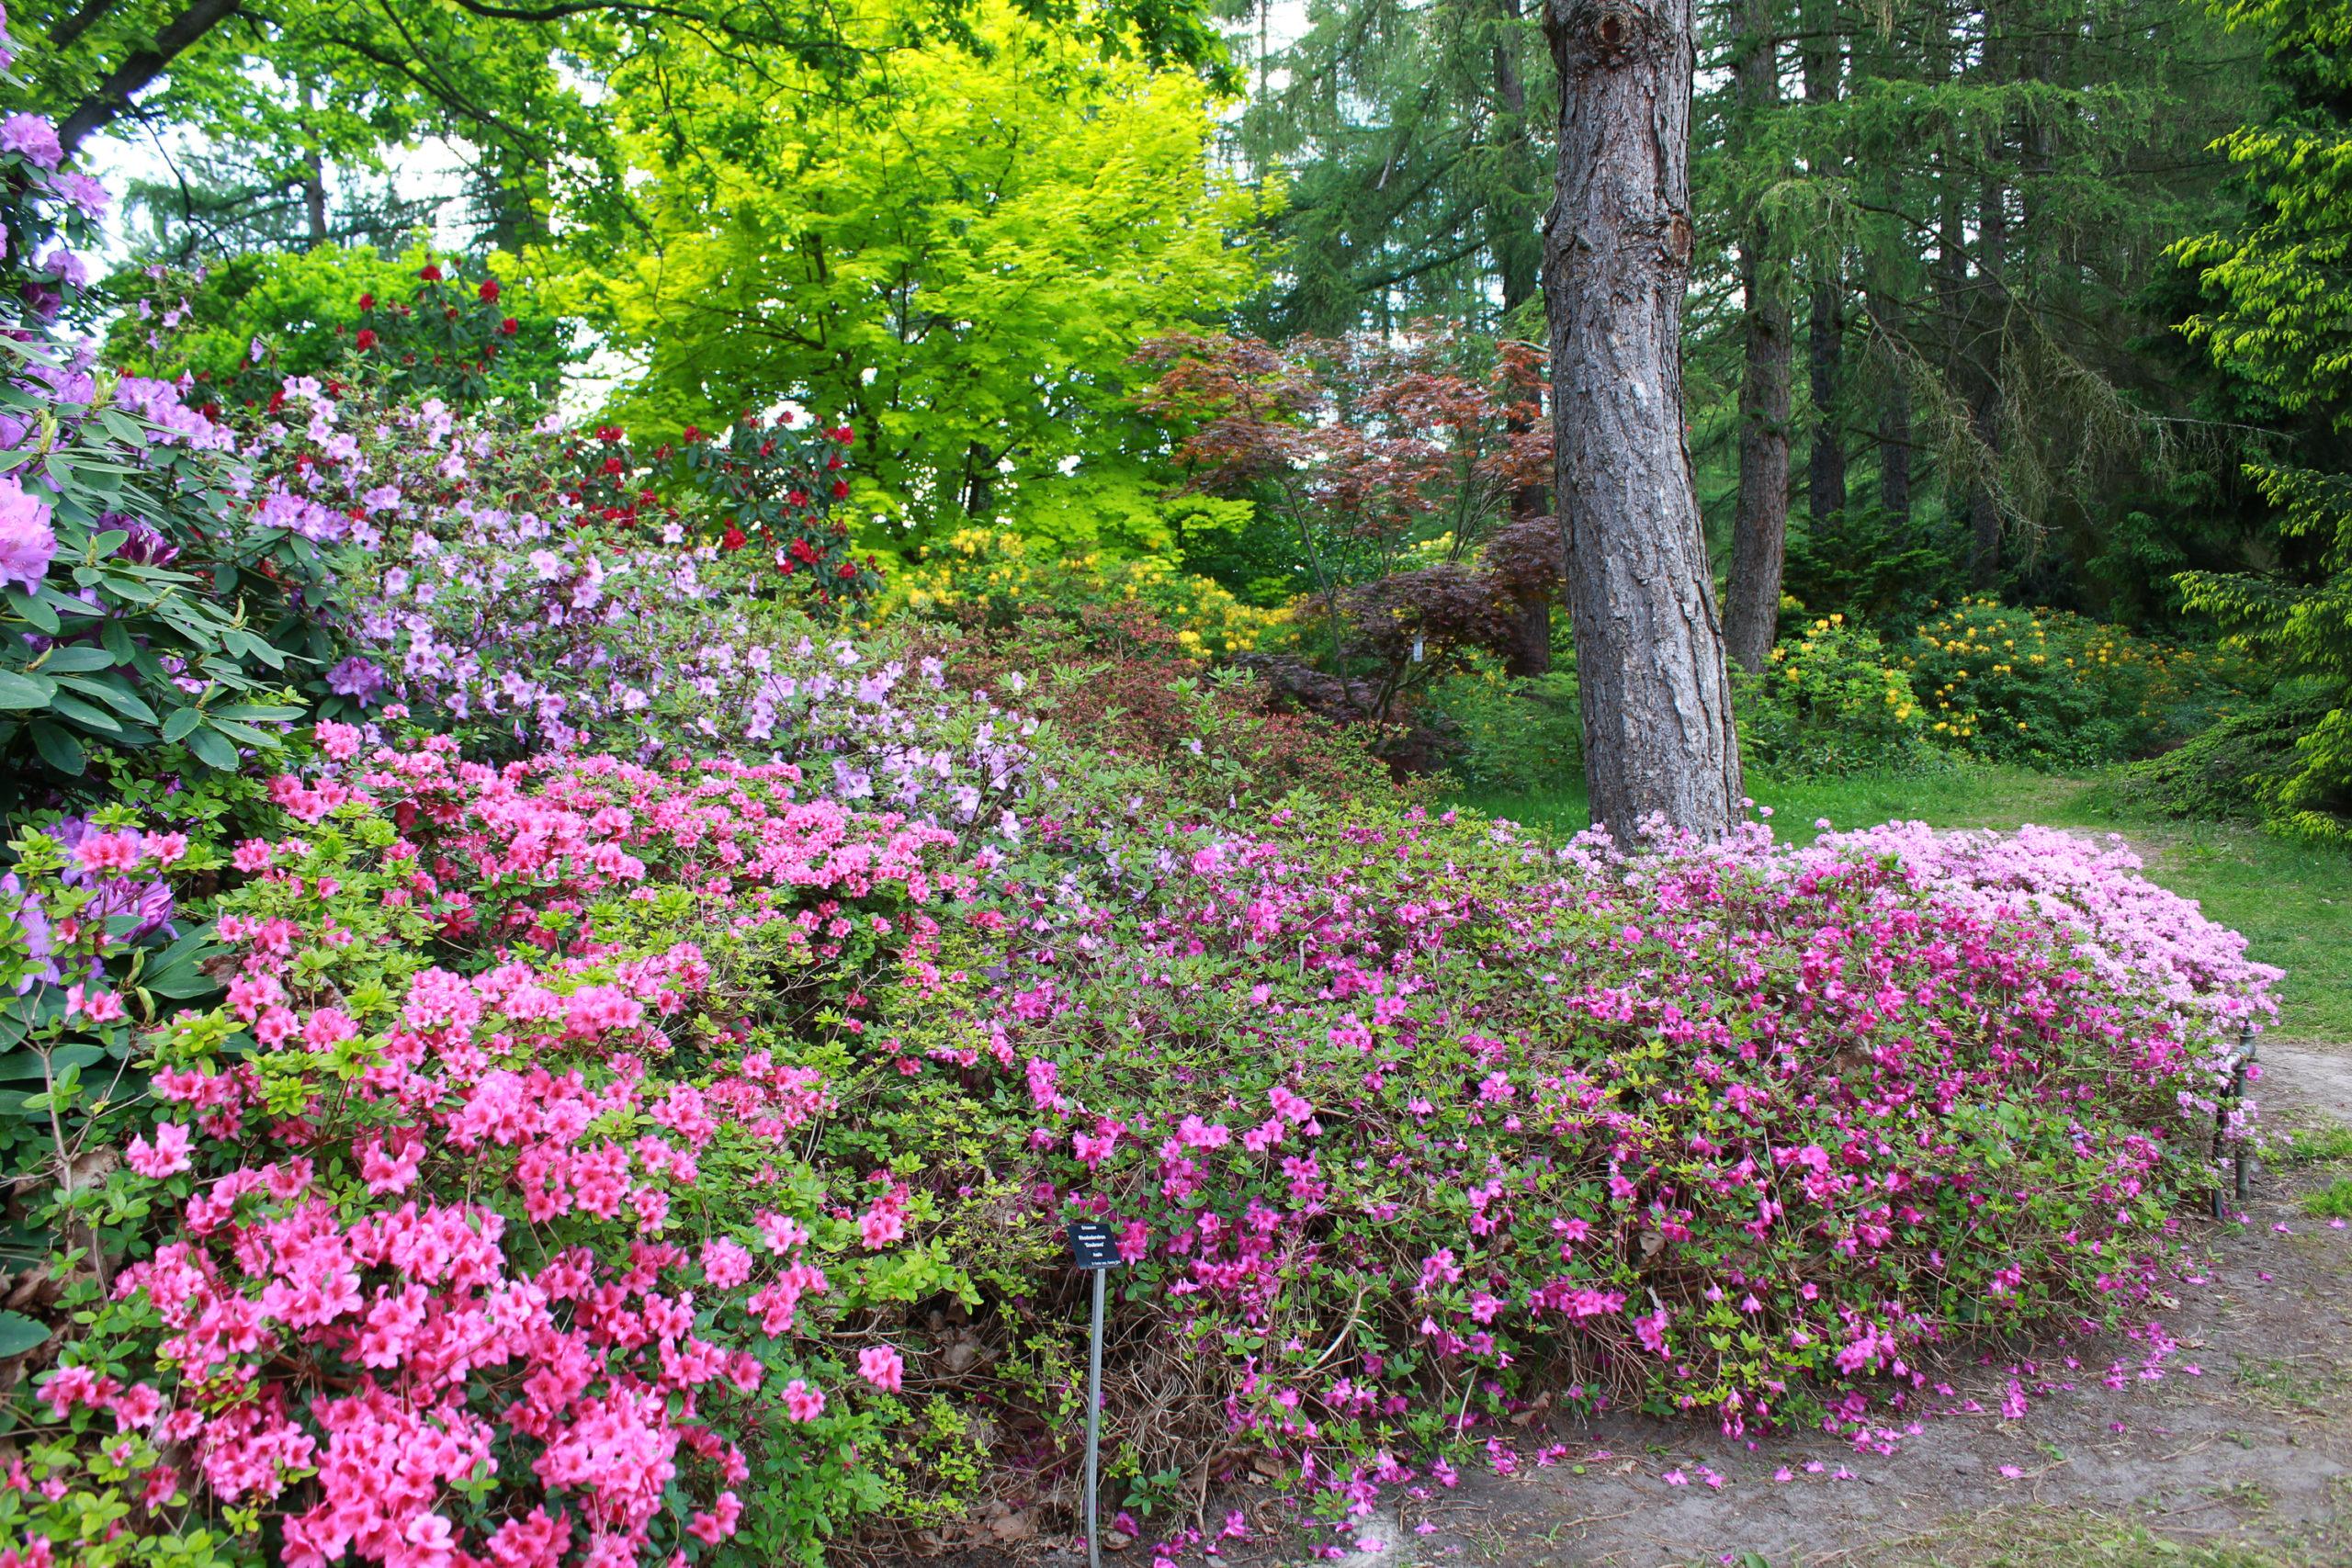 Powsin, ogród botaniczny PAN